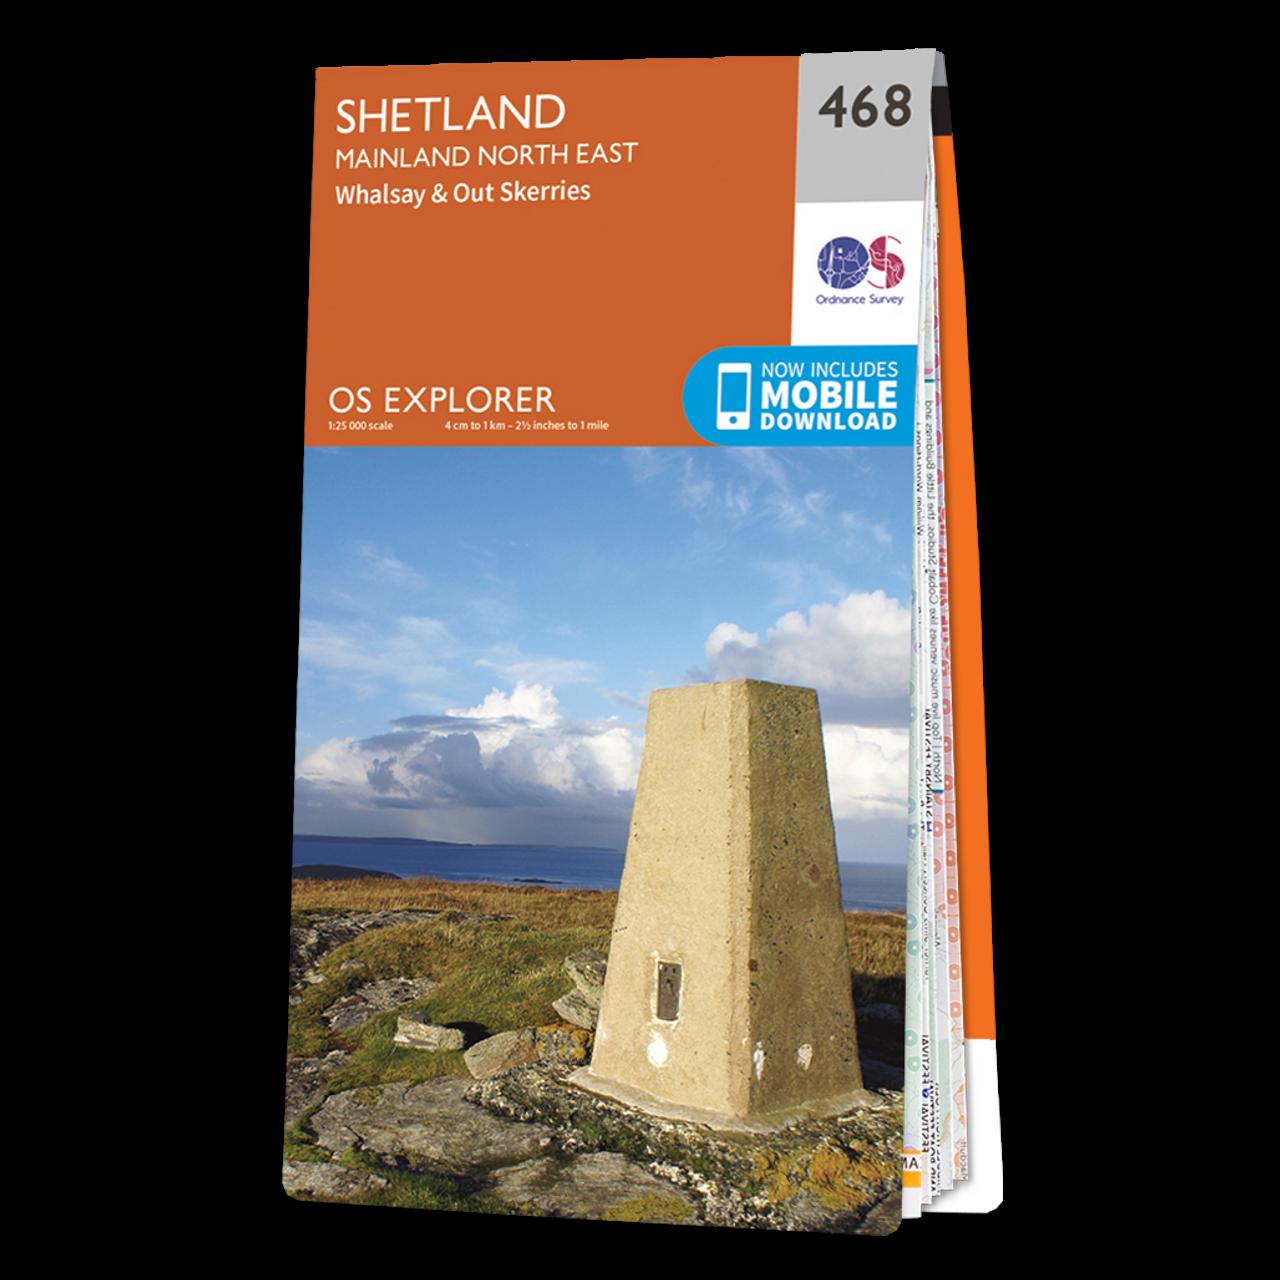 Map Of Shetland - Mainland North East